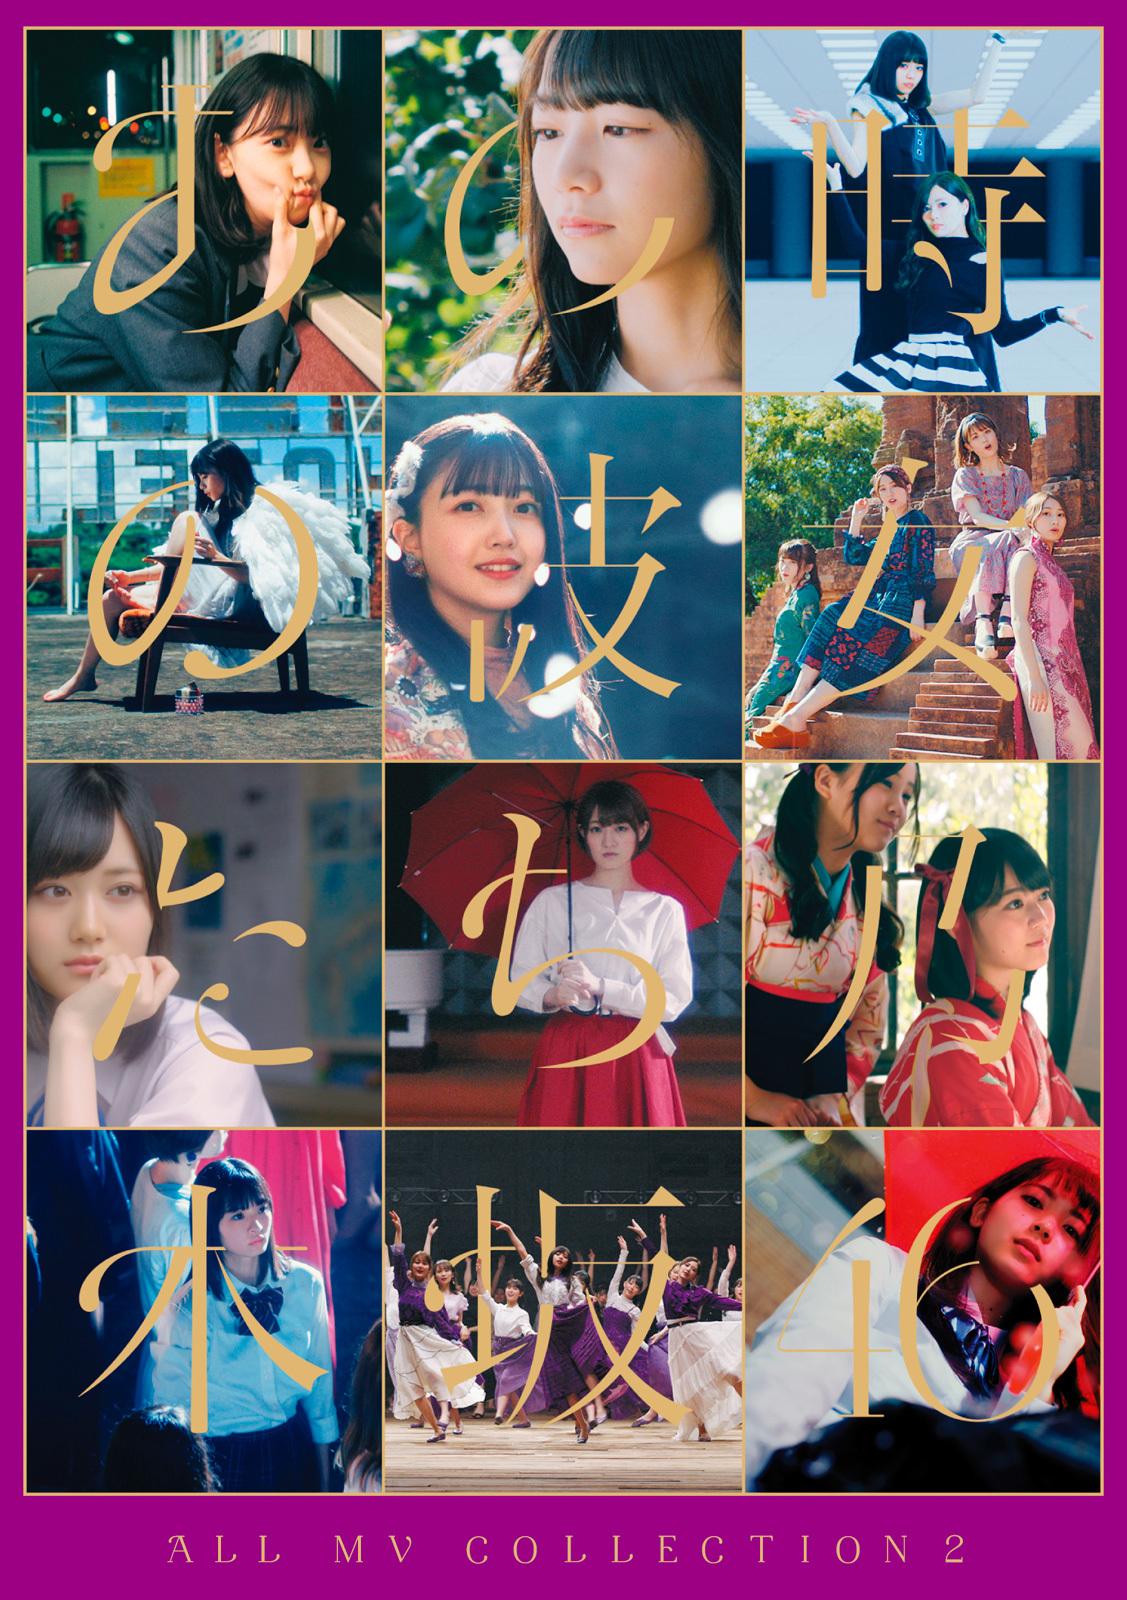 乃木坂46「ALL MV COLLECTION 2」ジャケ写 初回仕様限定盤Blu-ray